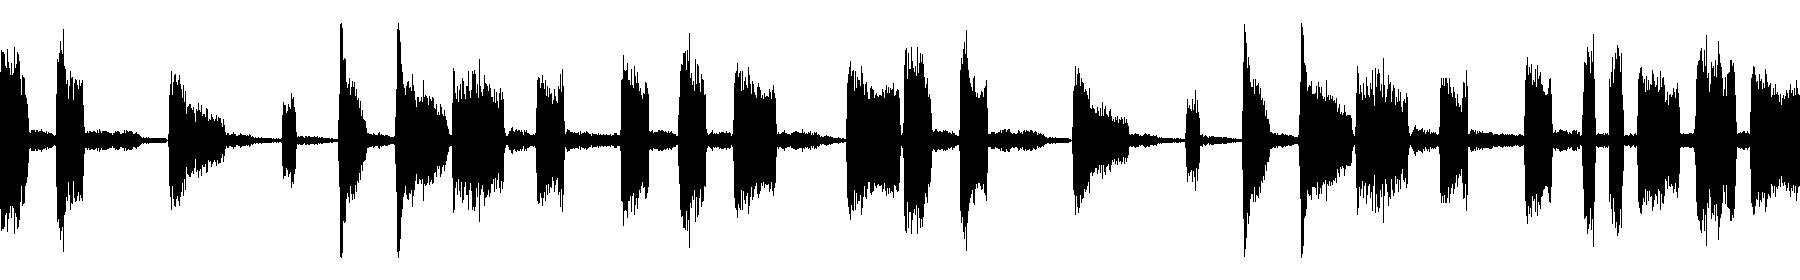 veh2 special sounds   35